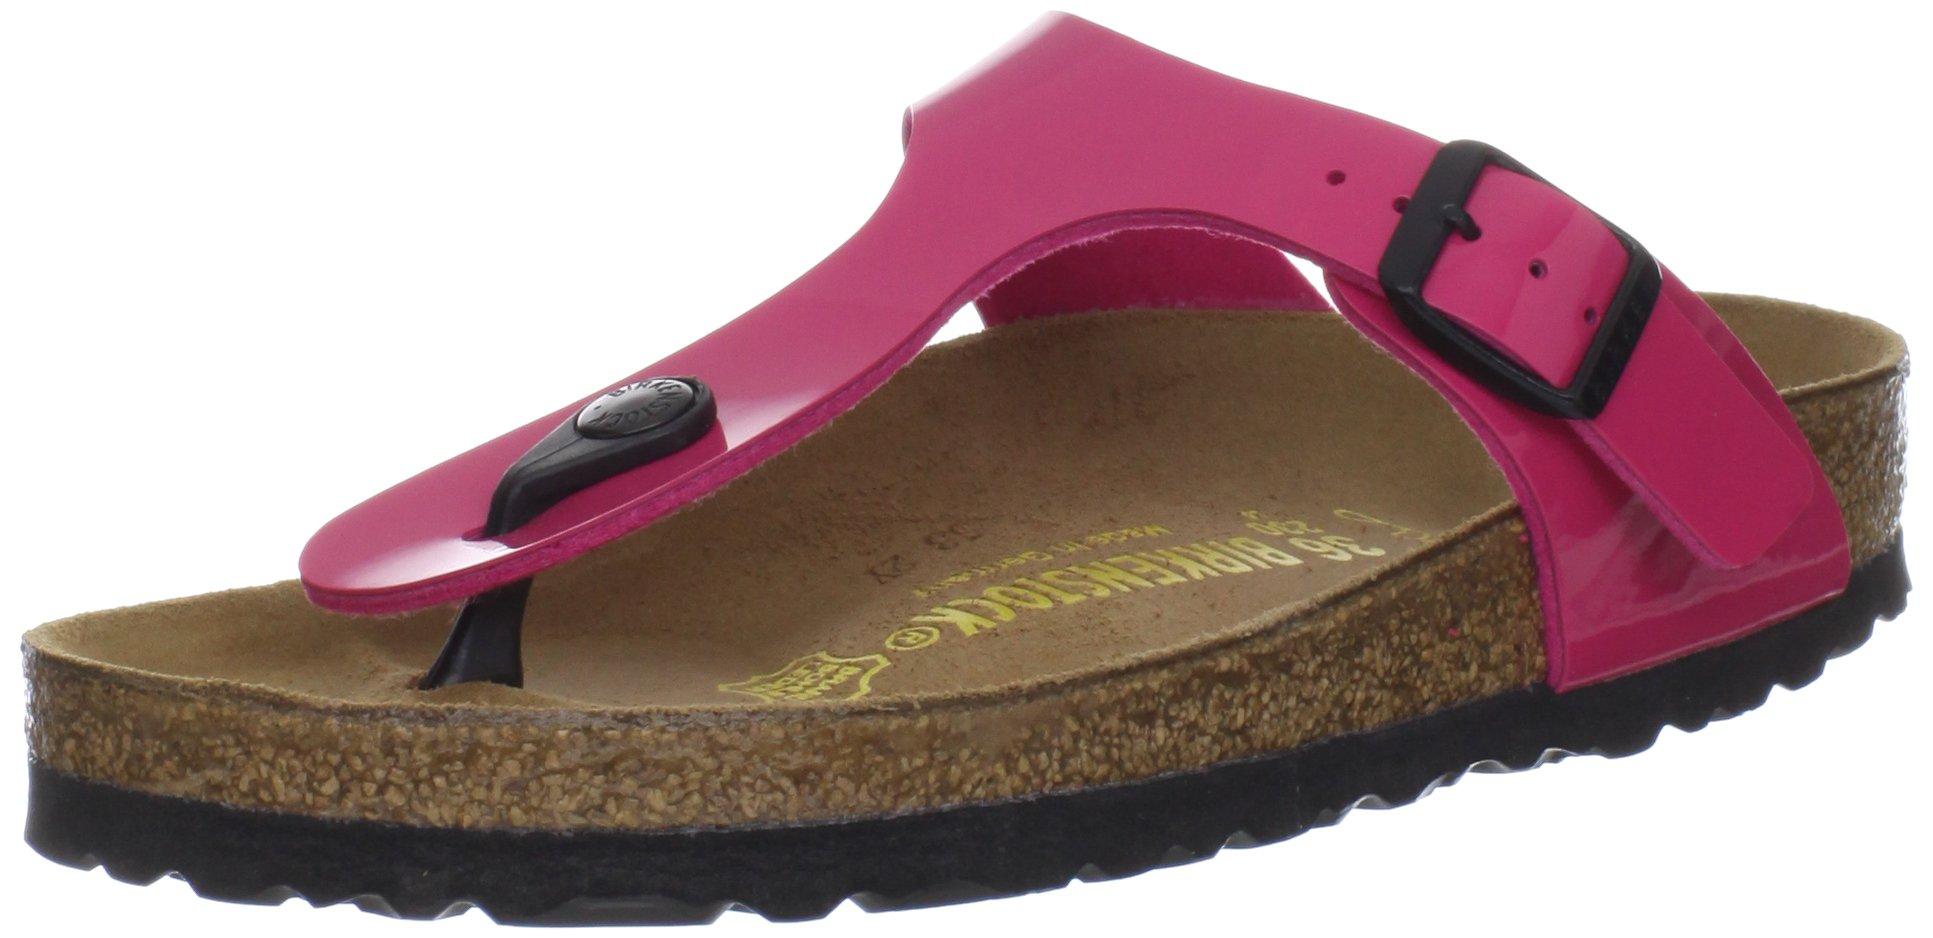 Birkenstock Women's GIzeh Thong Sandal, Lack Pink, 37 M EU/6-6.5 B(M) US